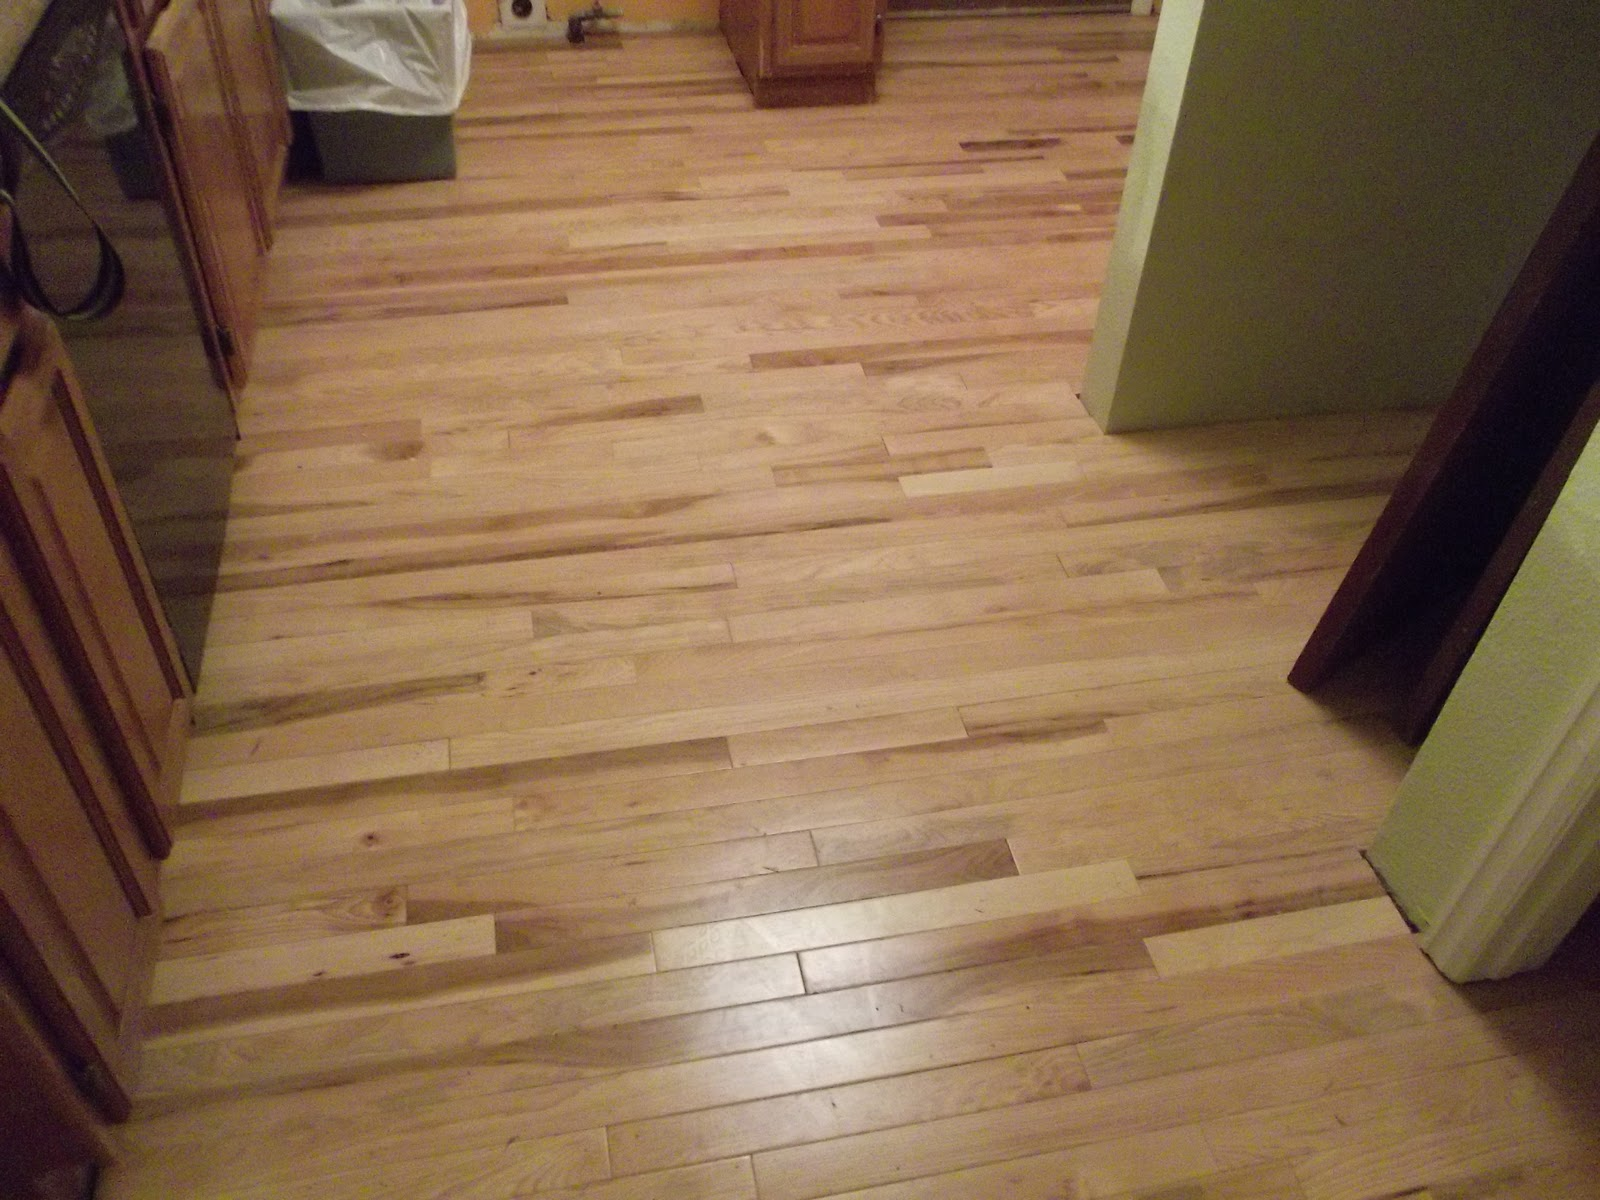 Hickory Hardwood Flooring Sale 2 1 4 Quot Prefinished